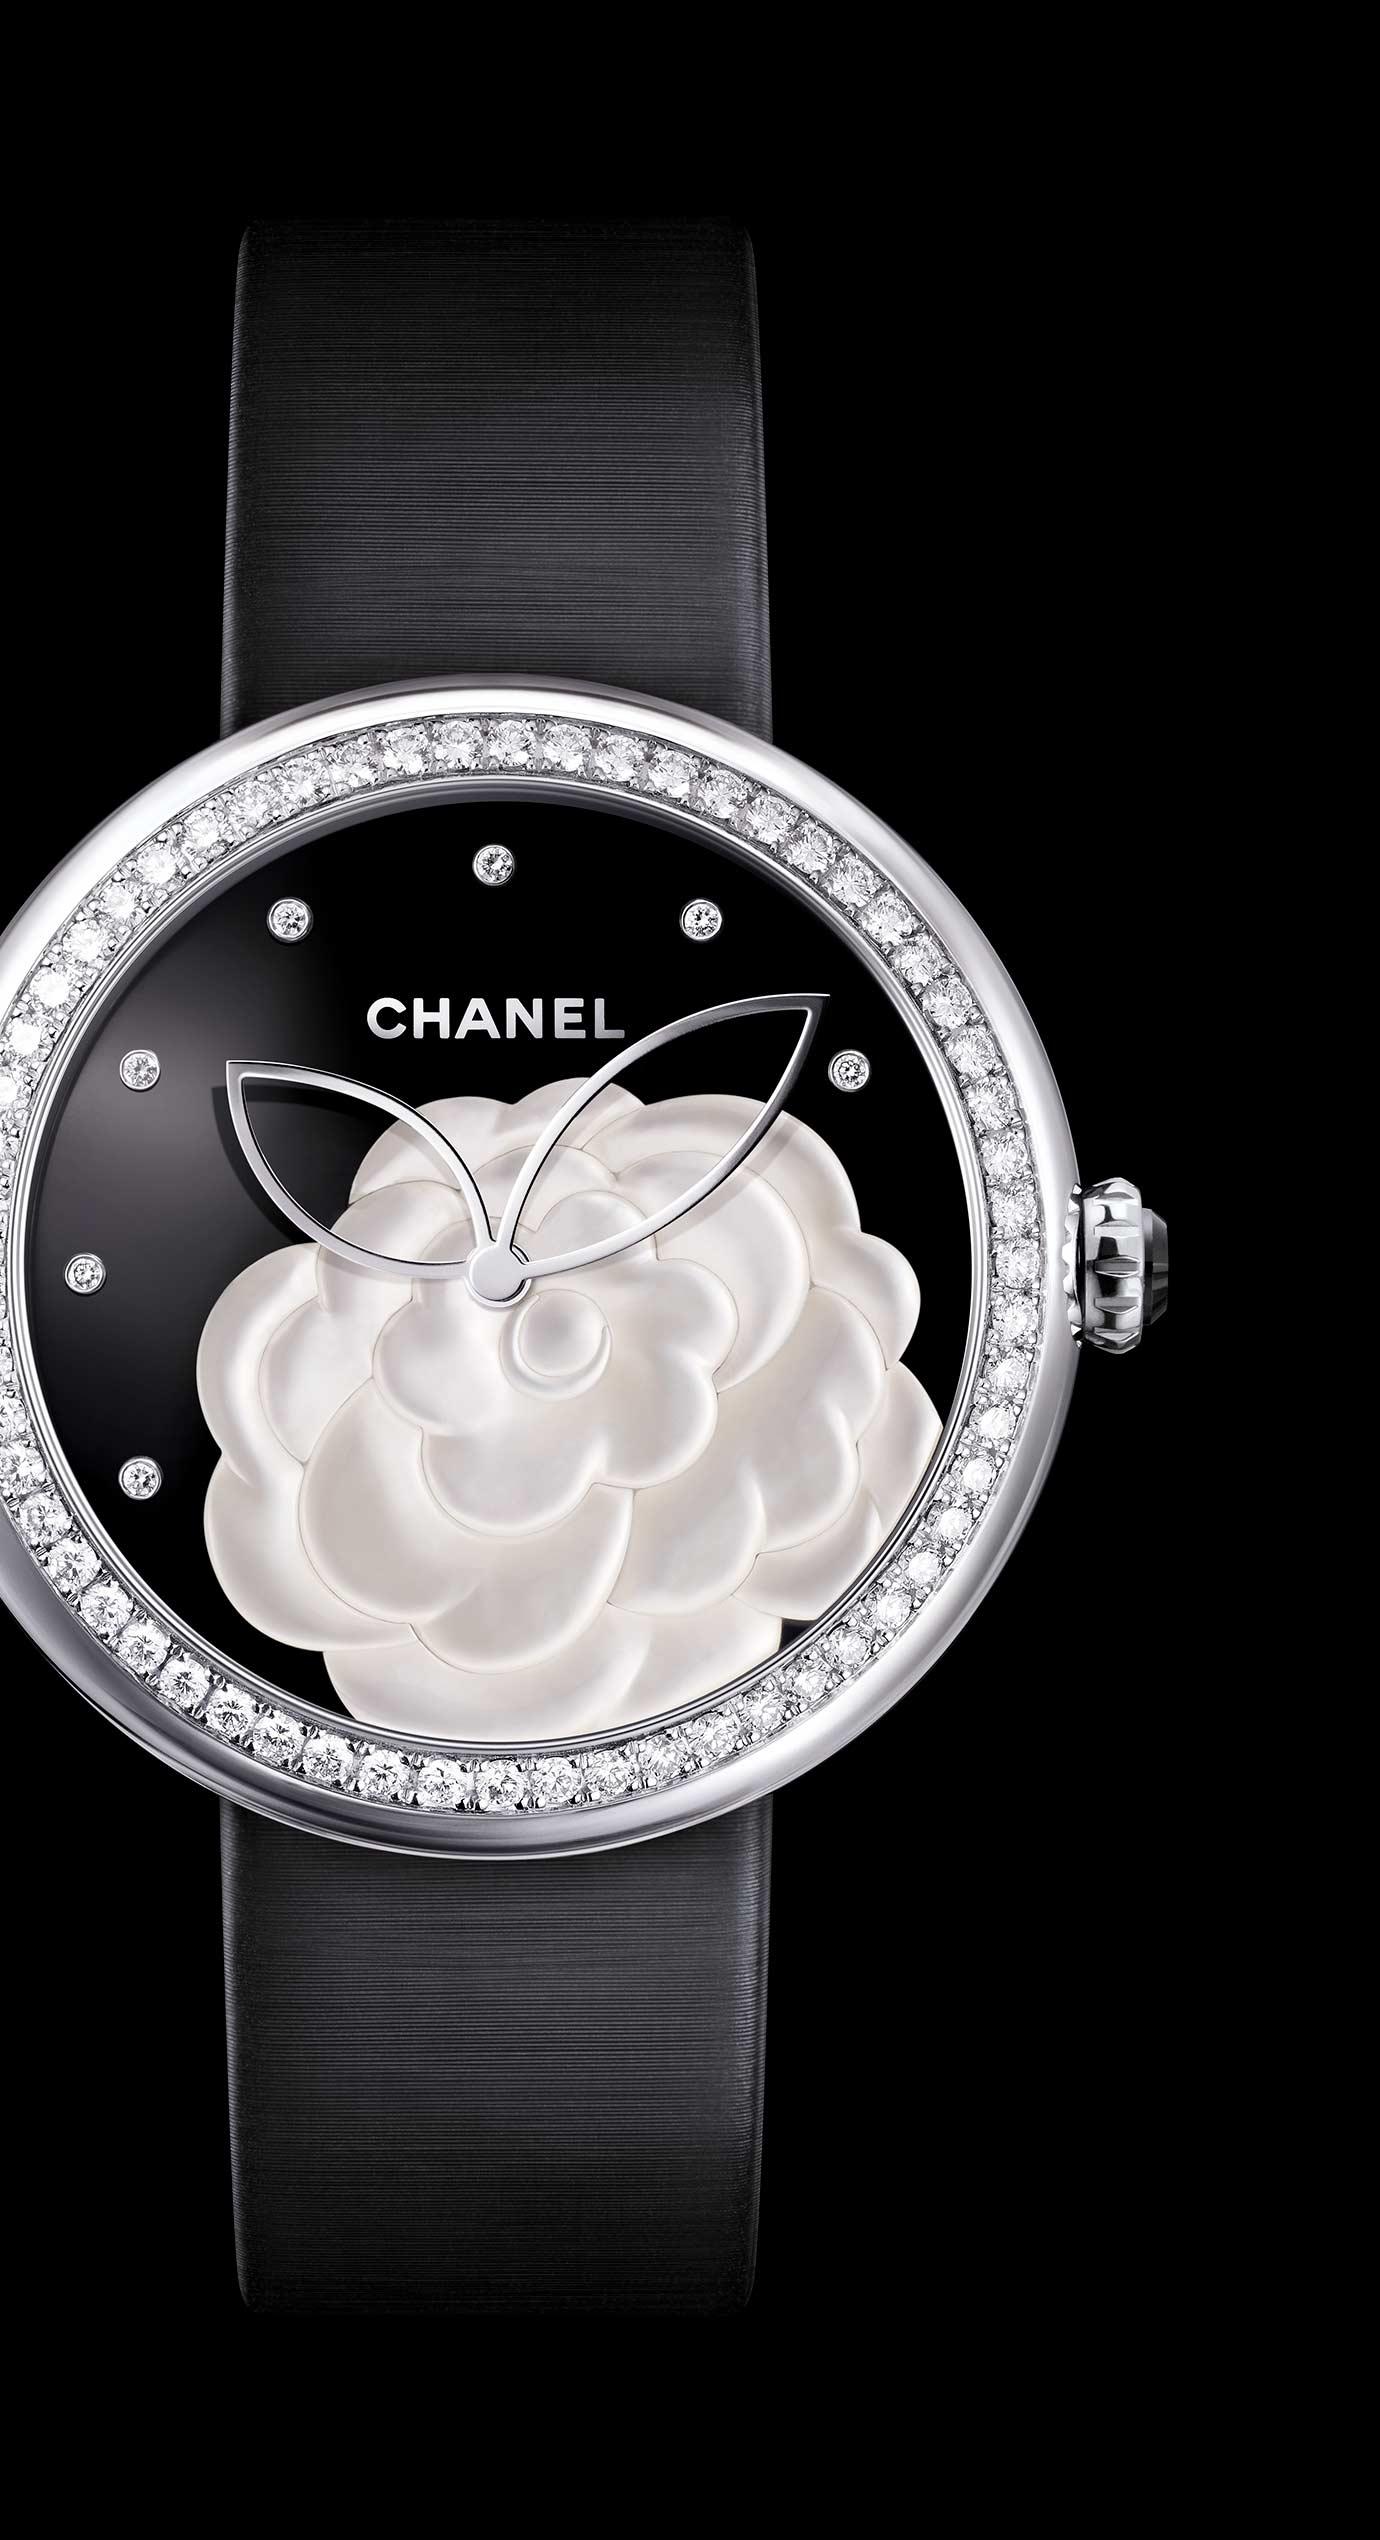 Reloj Mademoiselle Privé Camélia en marquetería en nácar, esfera en ónice, índices diamantes - Vista ampliada